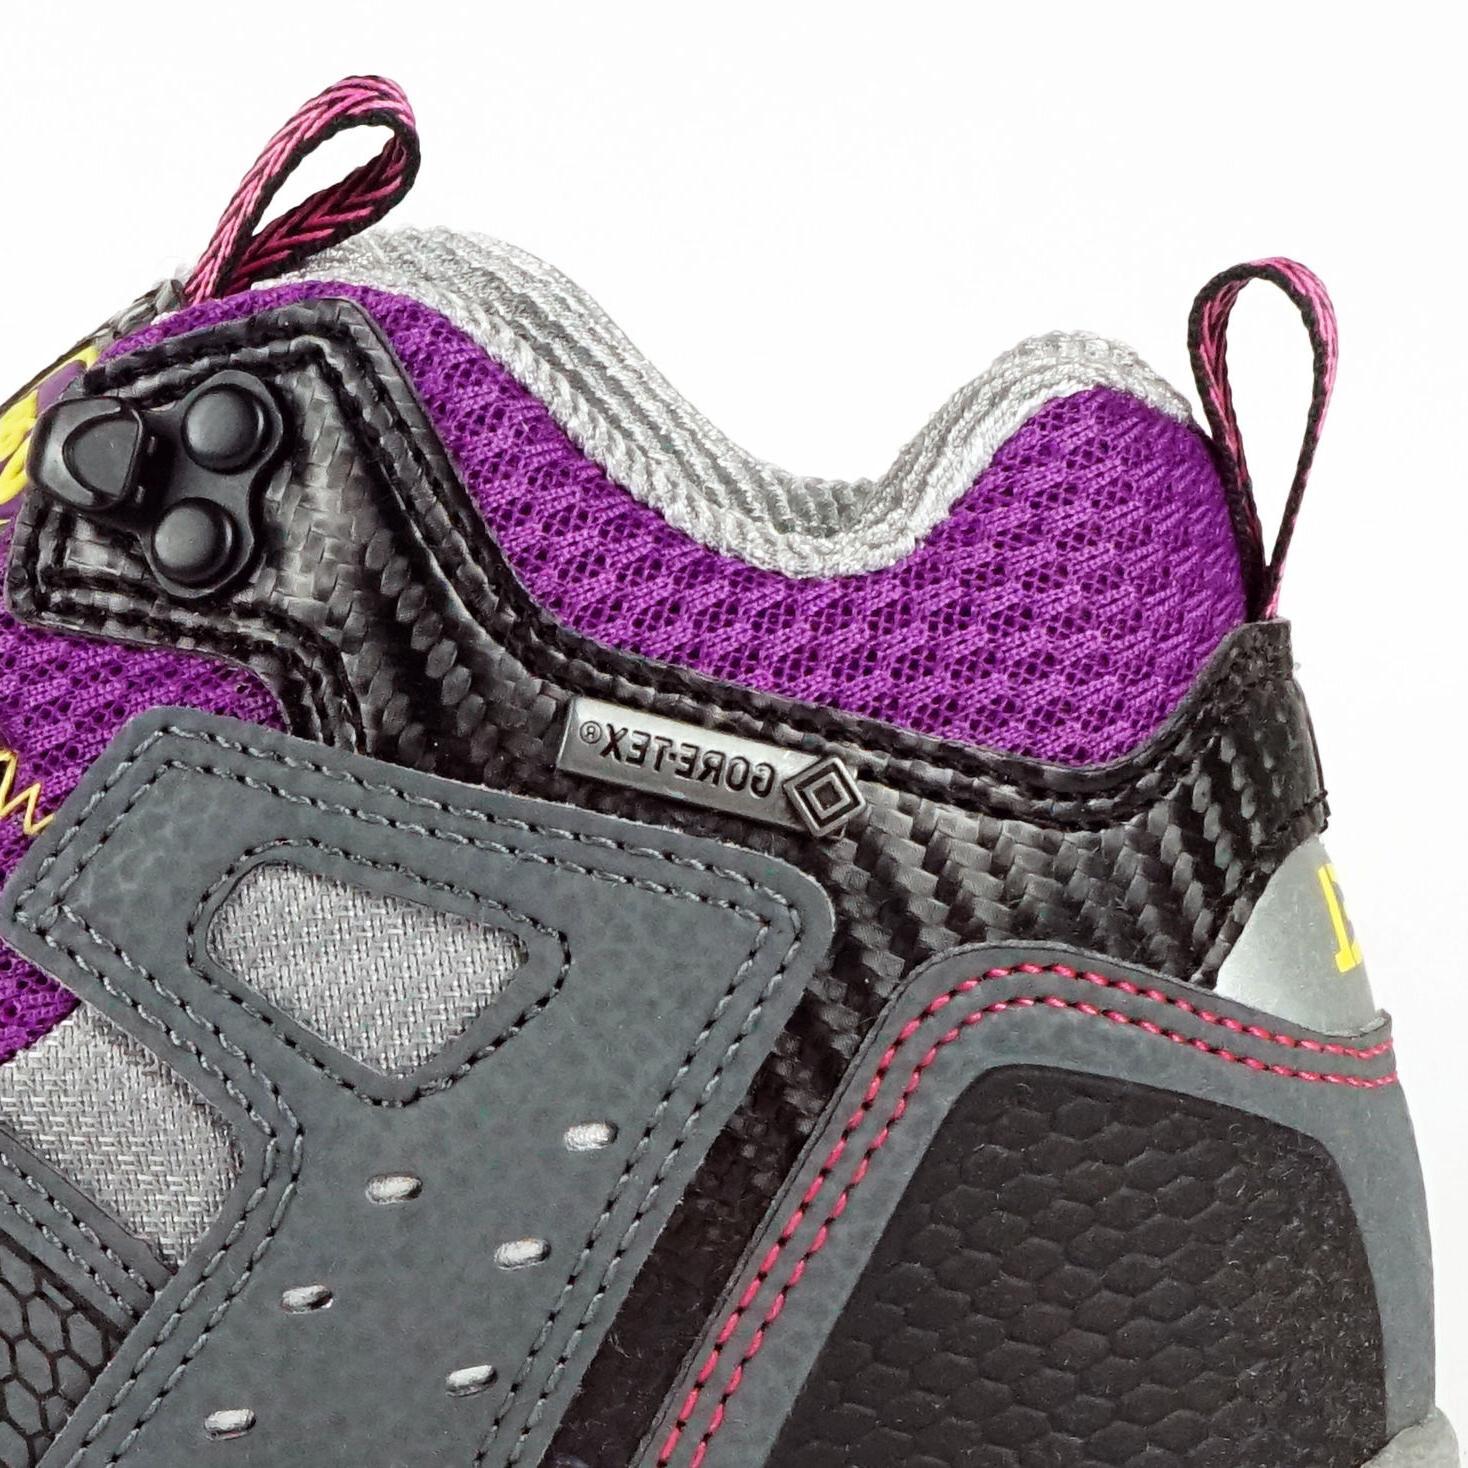 Asics GEL-MONTALTO Gore-tex Mid Hiking Boots